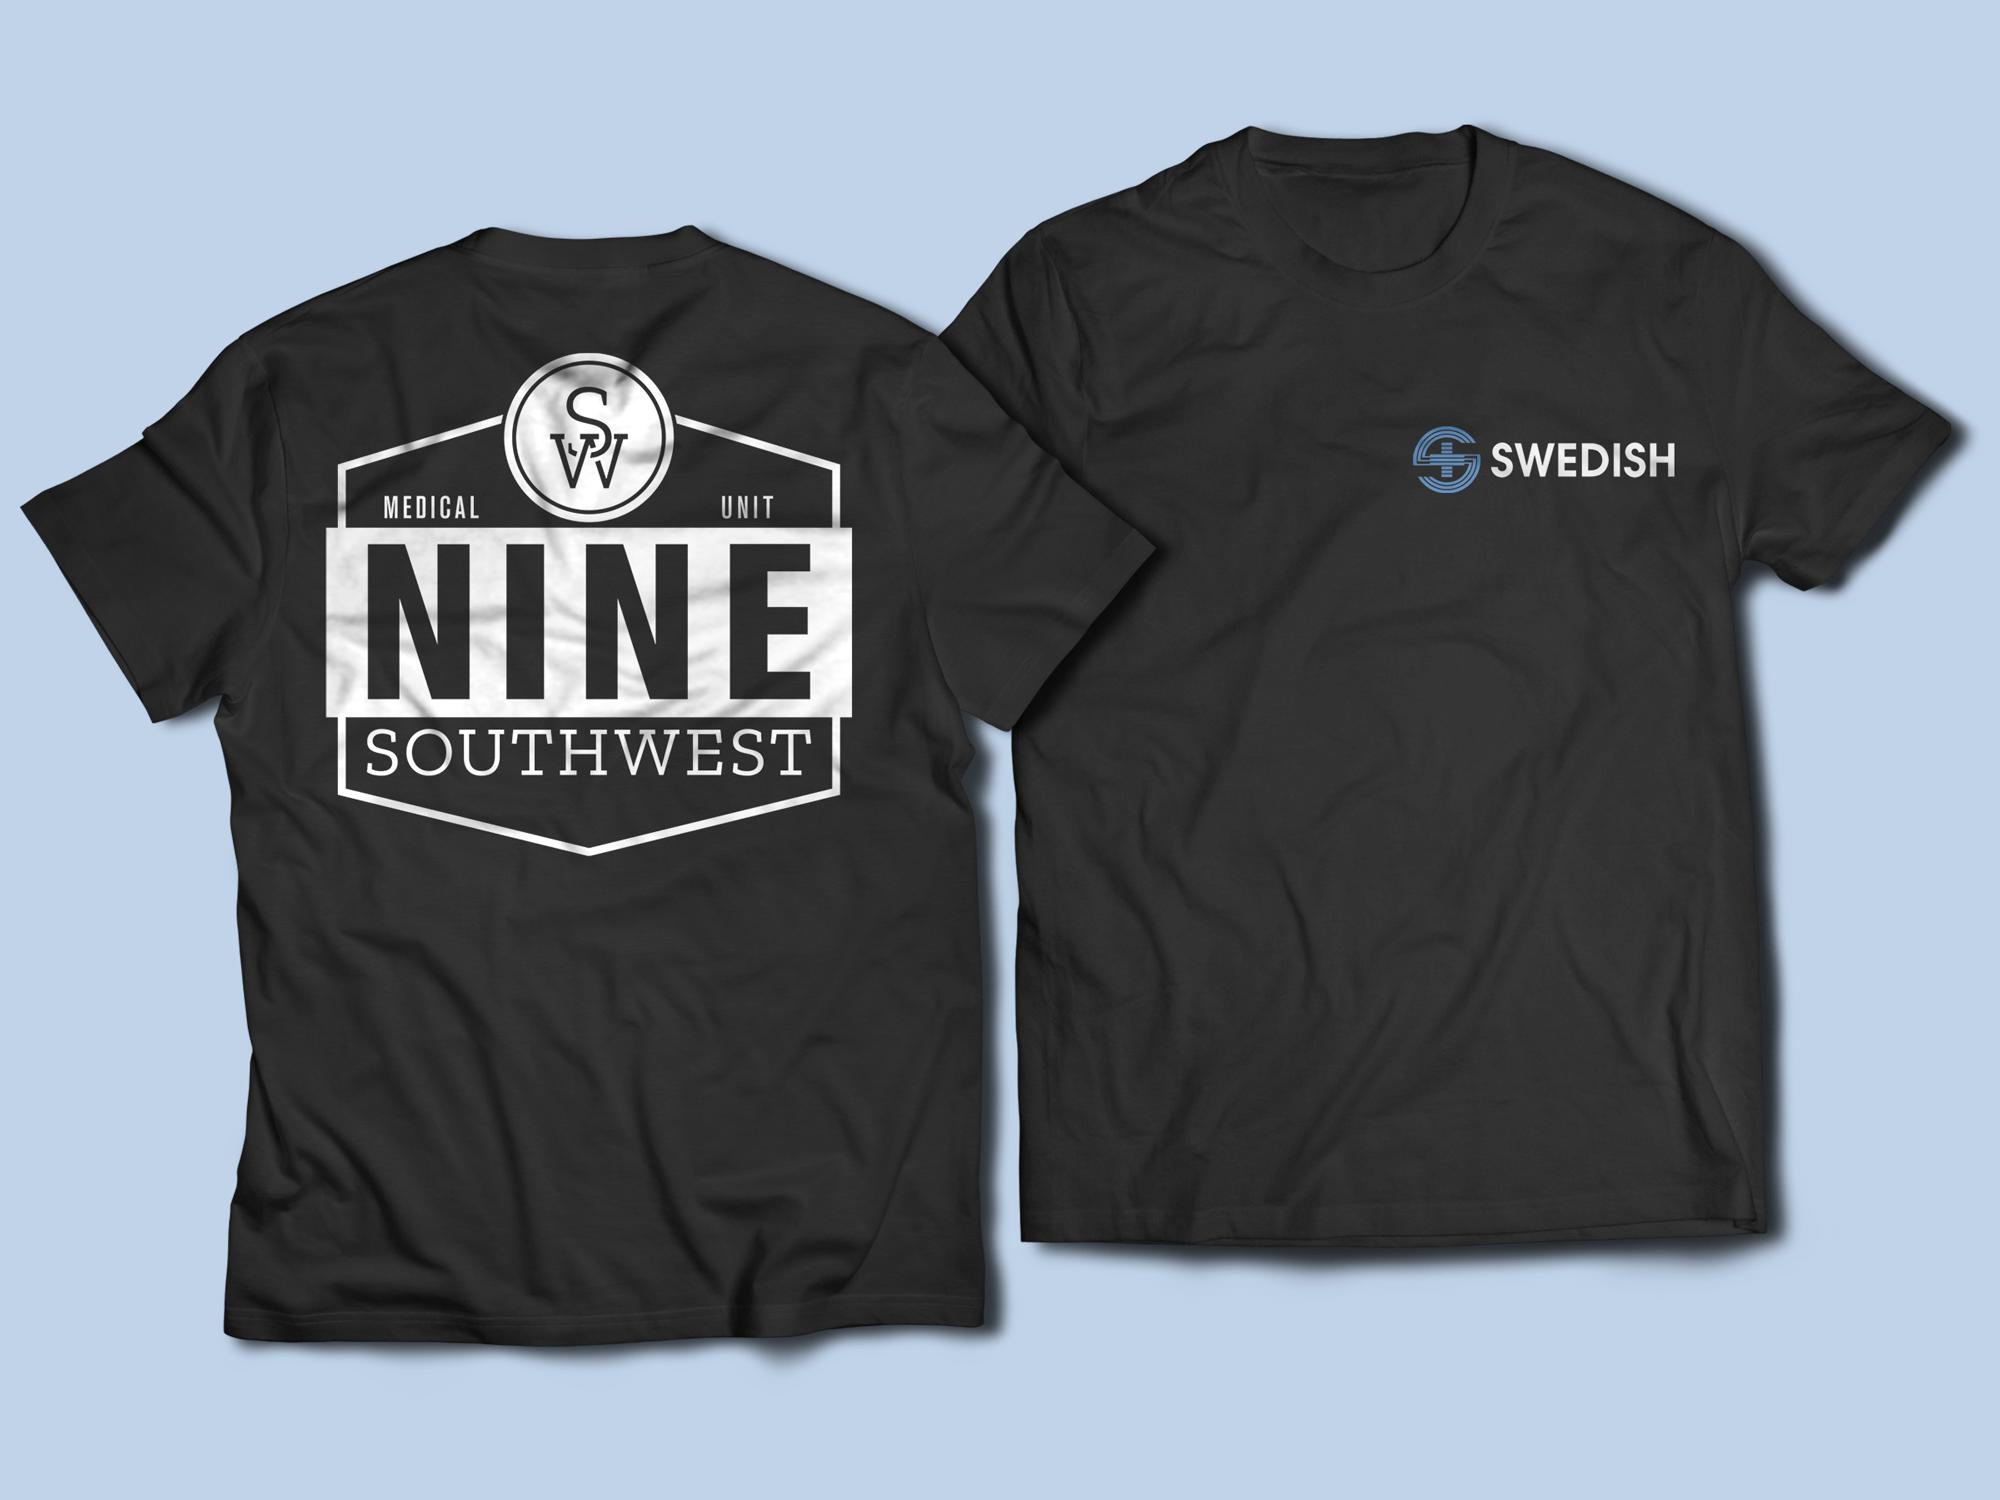 9-southewst-shirt-mock